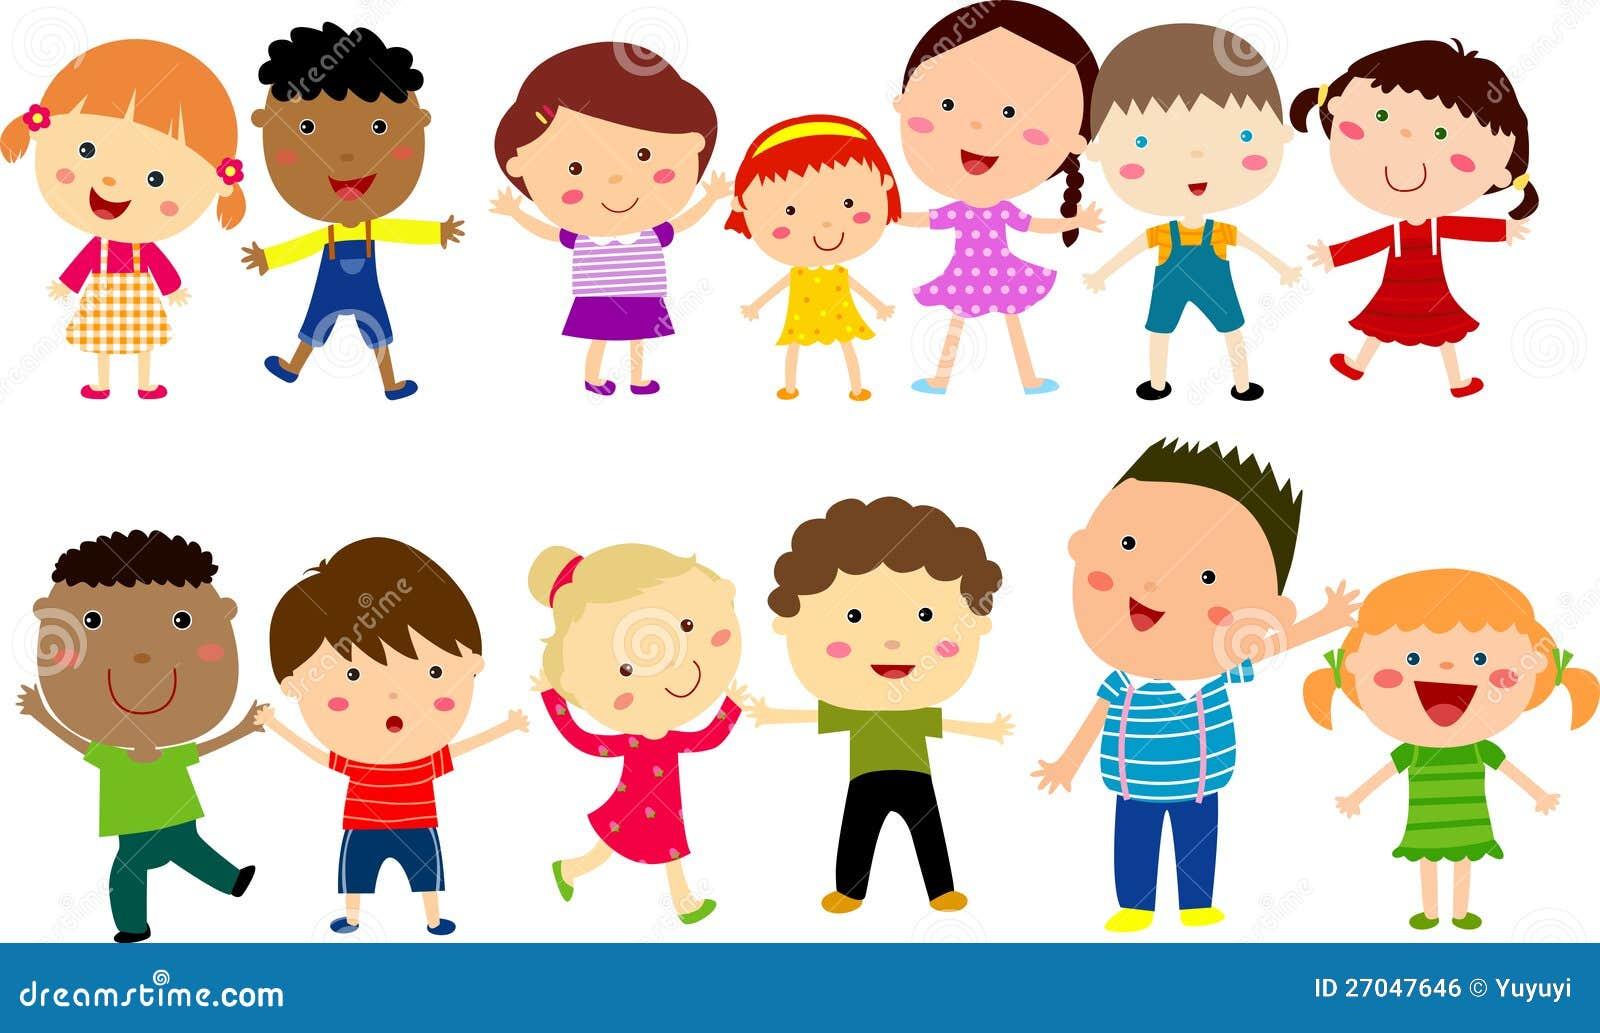 Royalty Free Stock Image: Cute cartoon kids. Image: 27047646